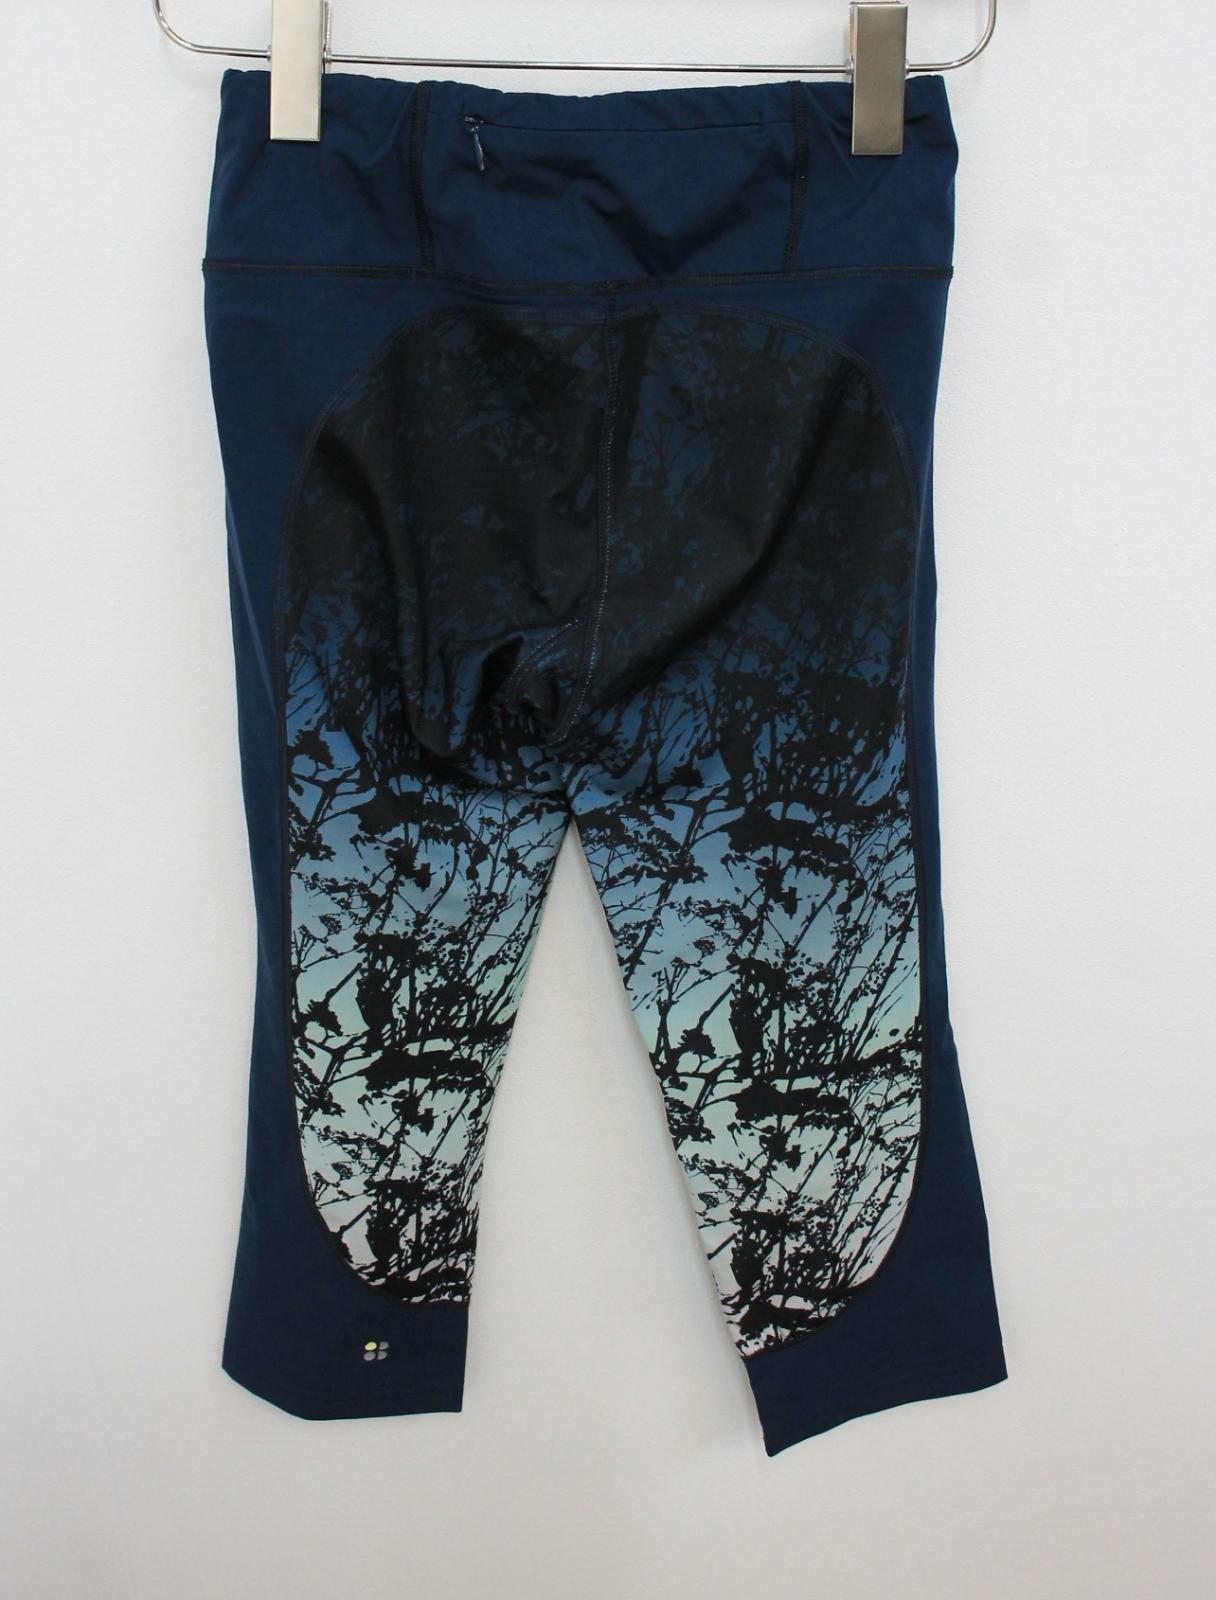 Sweaty-Betty-Damas-Azul-Oscuro-Impreso-Negro-Recortada-Leggings-Talla-S-W26-L18 miniatura 3